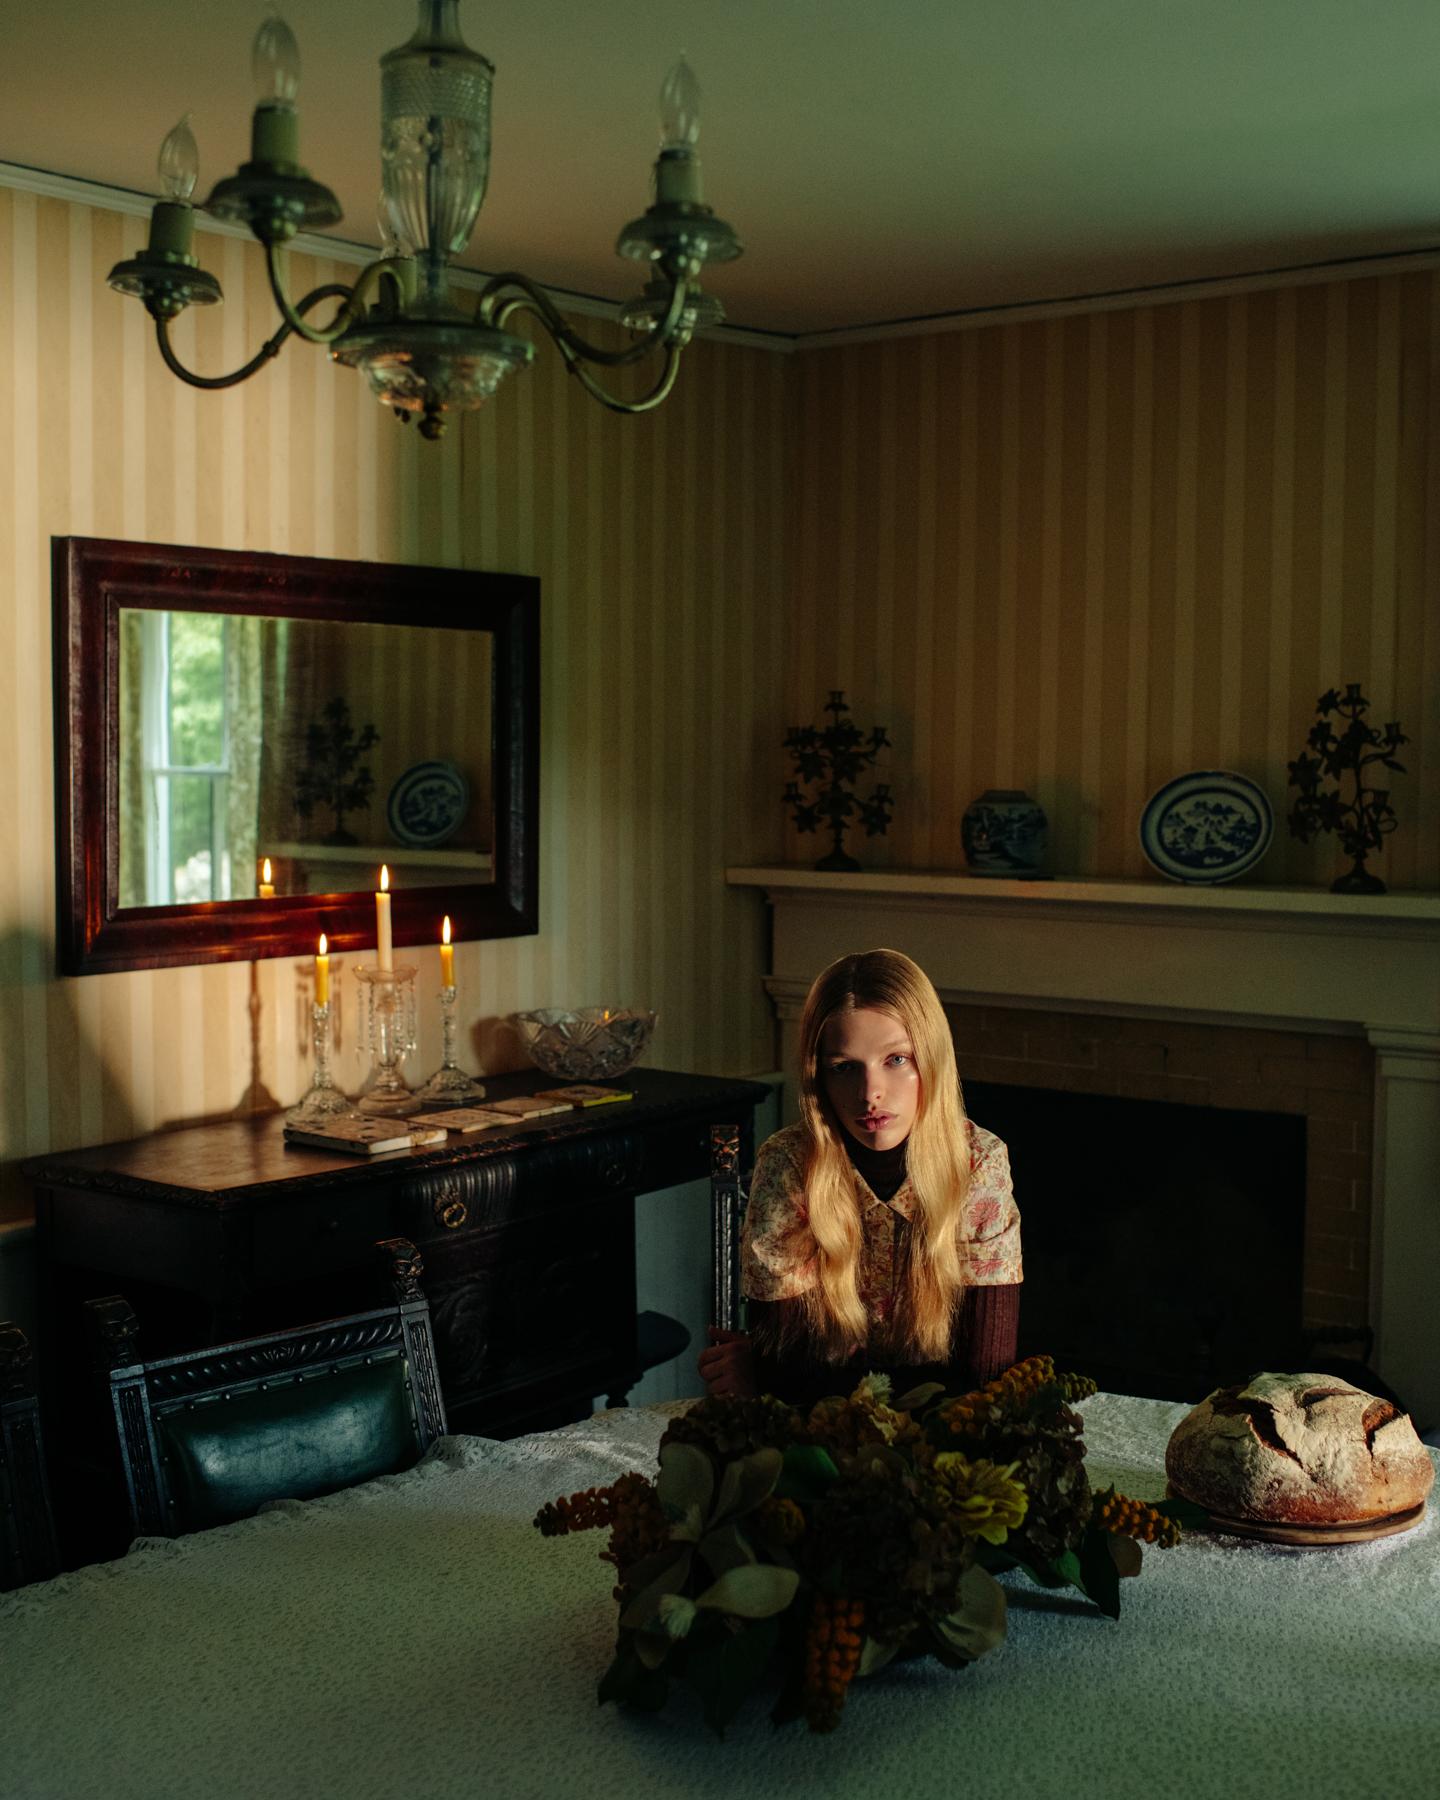 02-Clare-Crawford-by-Ivan-Bideac-for-Vogue-Italia-2410.jpg